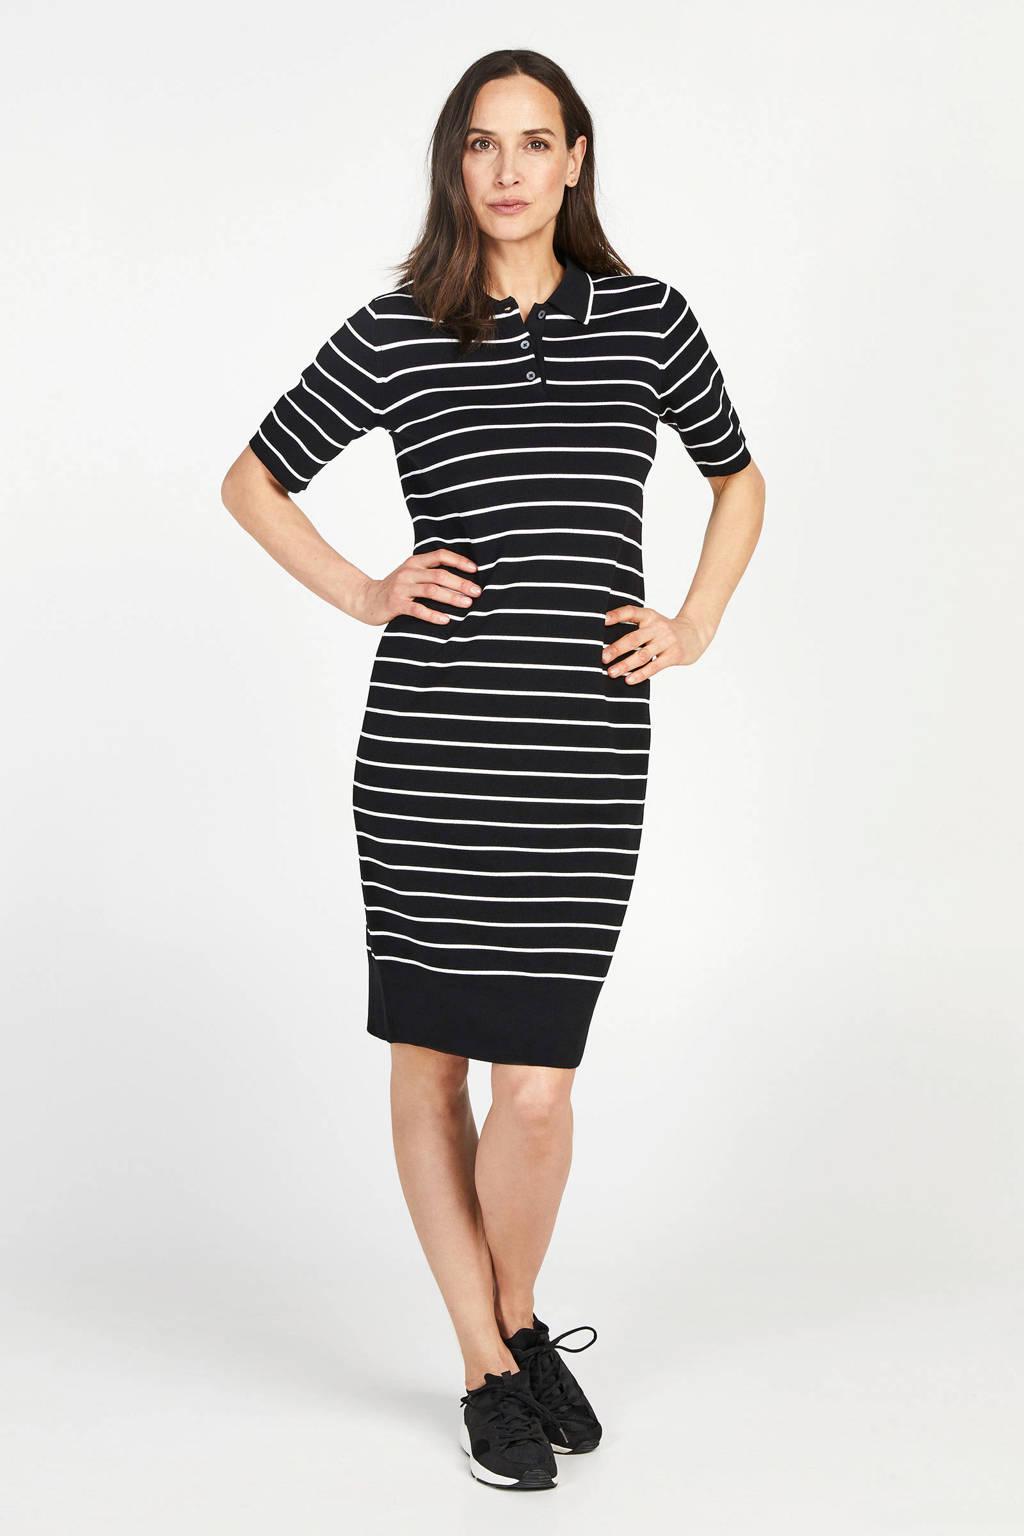 PROMISS gestreepte fijngebreide jurk zwart/wit, Zwart/wit